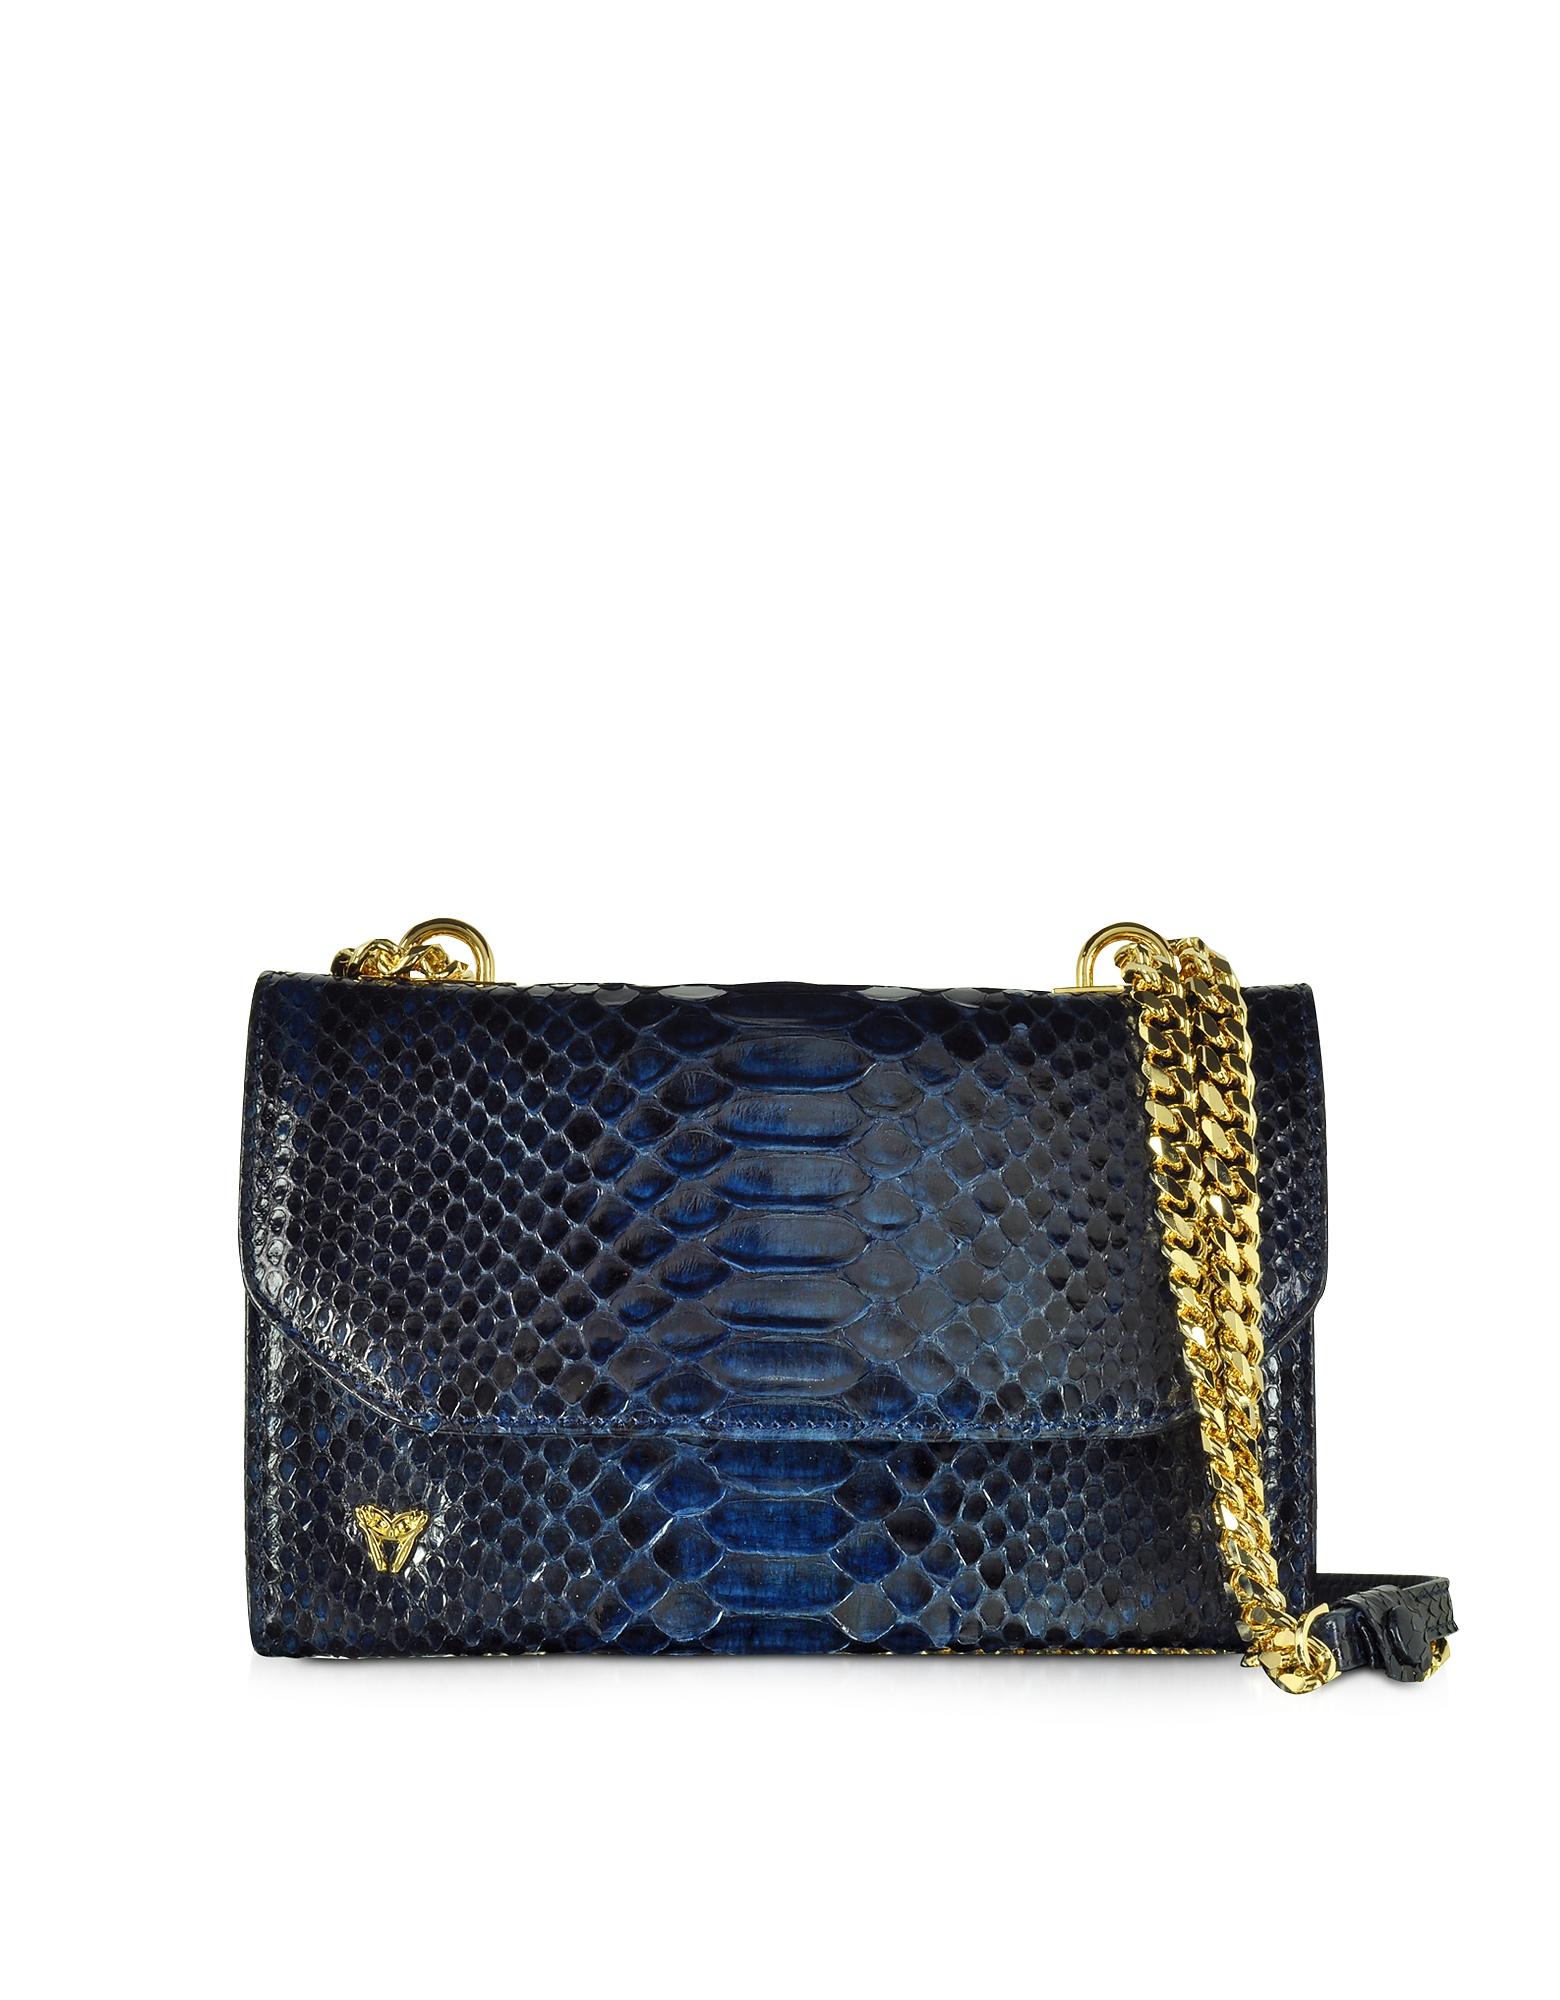 Ghibli Handbags, Small Phyton Leather Shoulder Bag